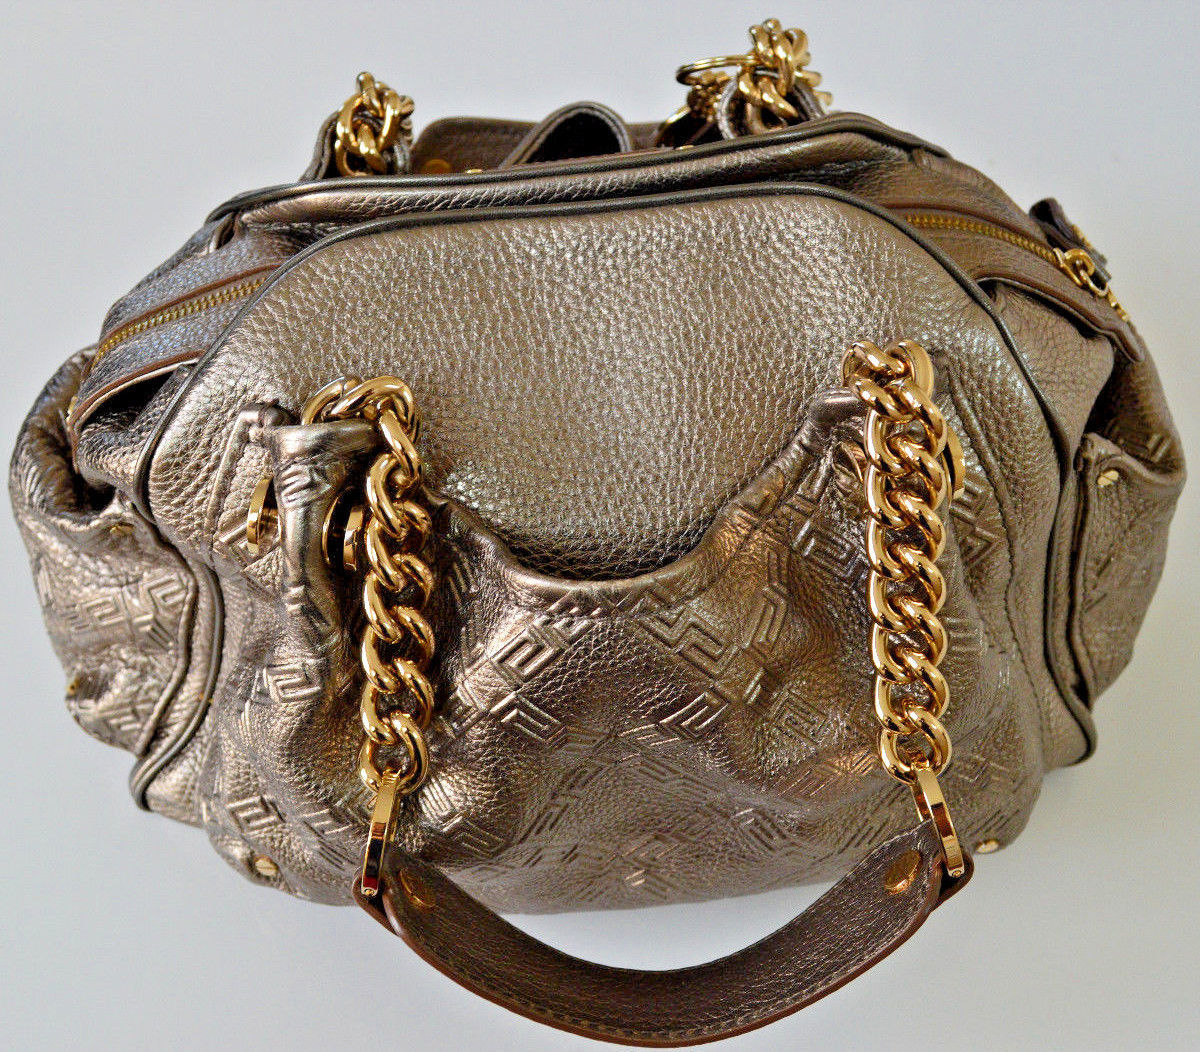 d4f6c8ccd13a BRAND NEW! 100% Authentic Versace Designer Medium Venus Style Handbag